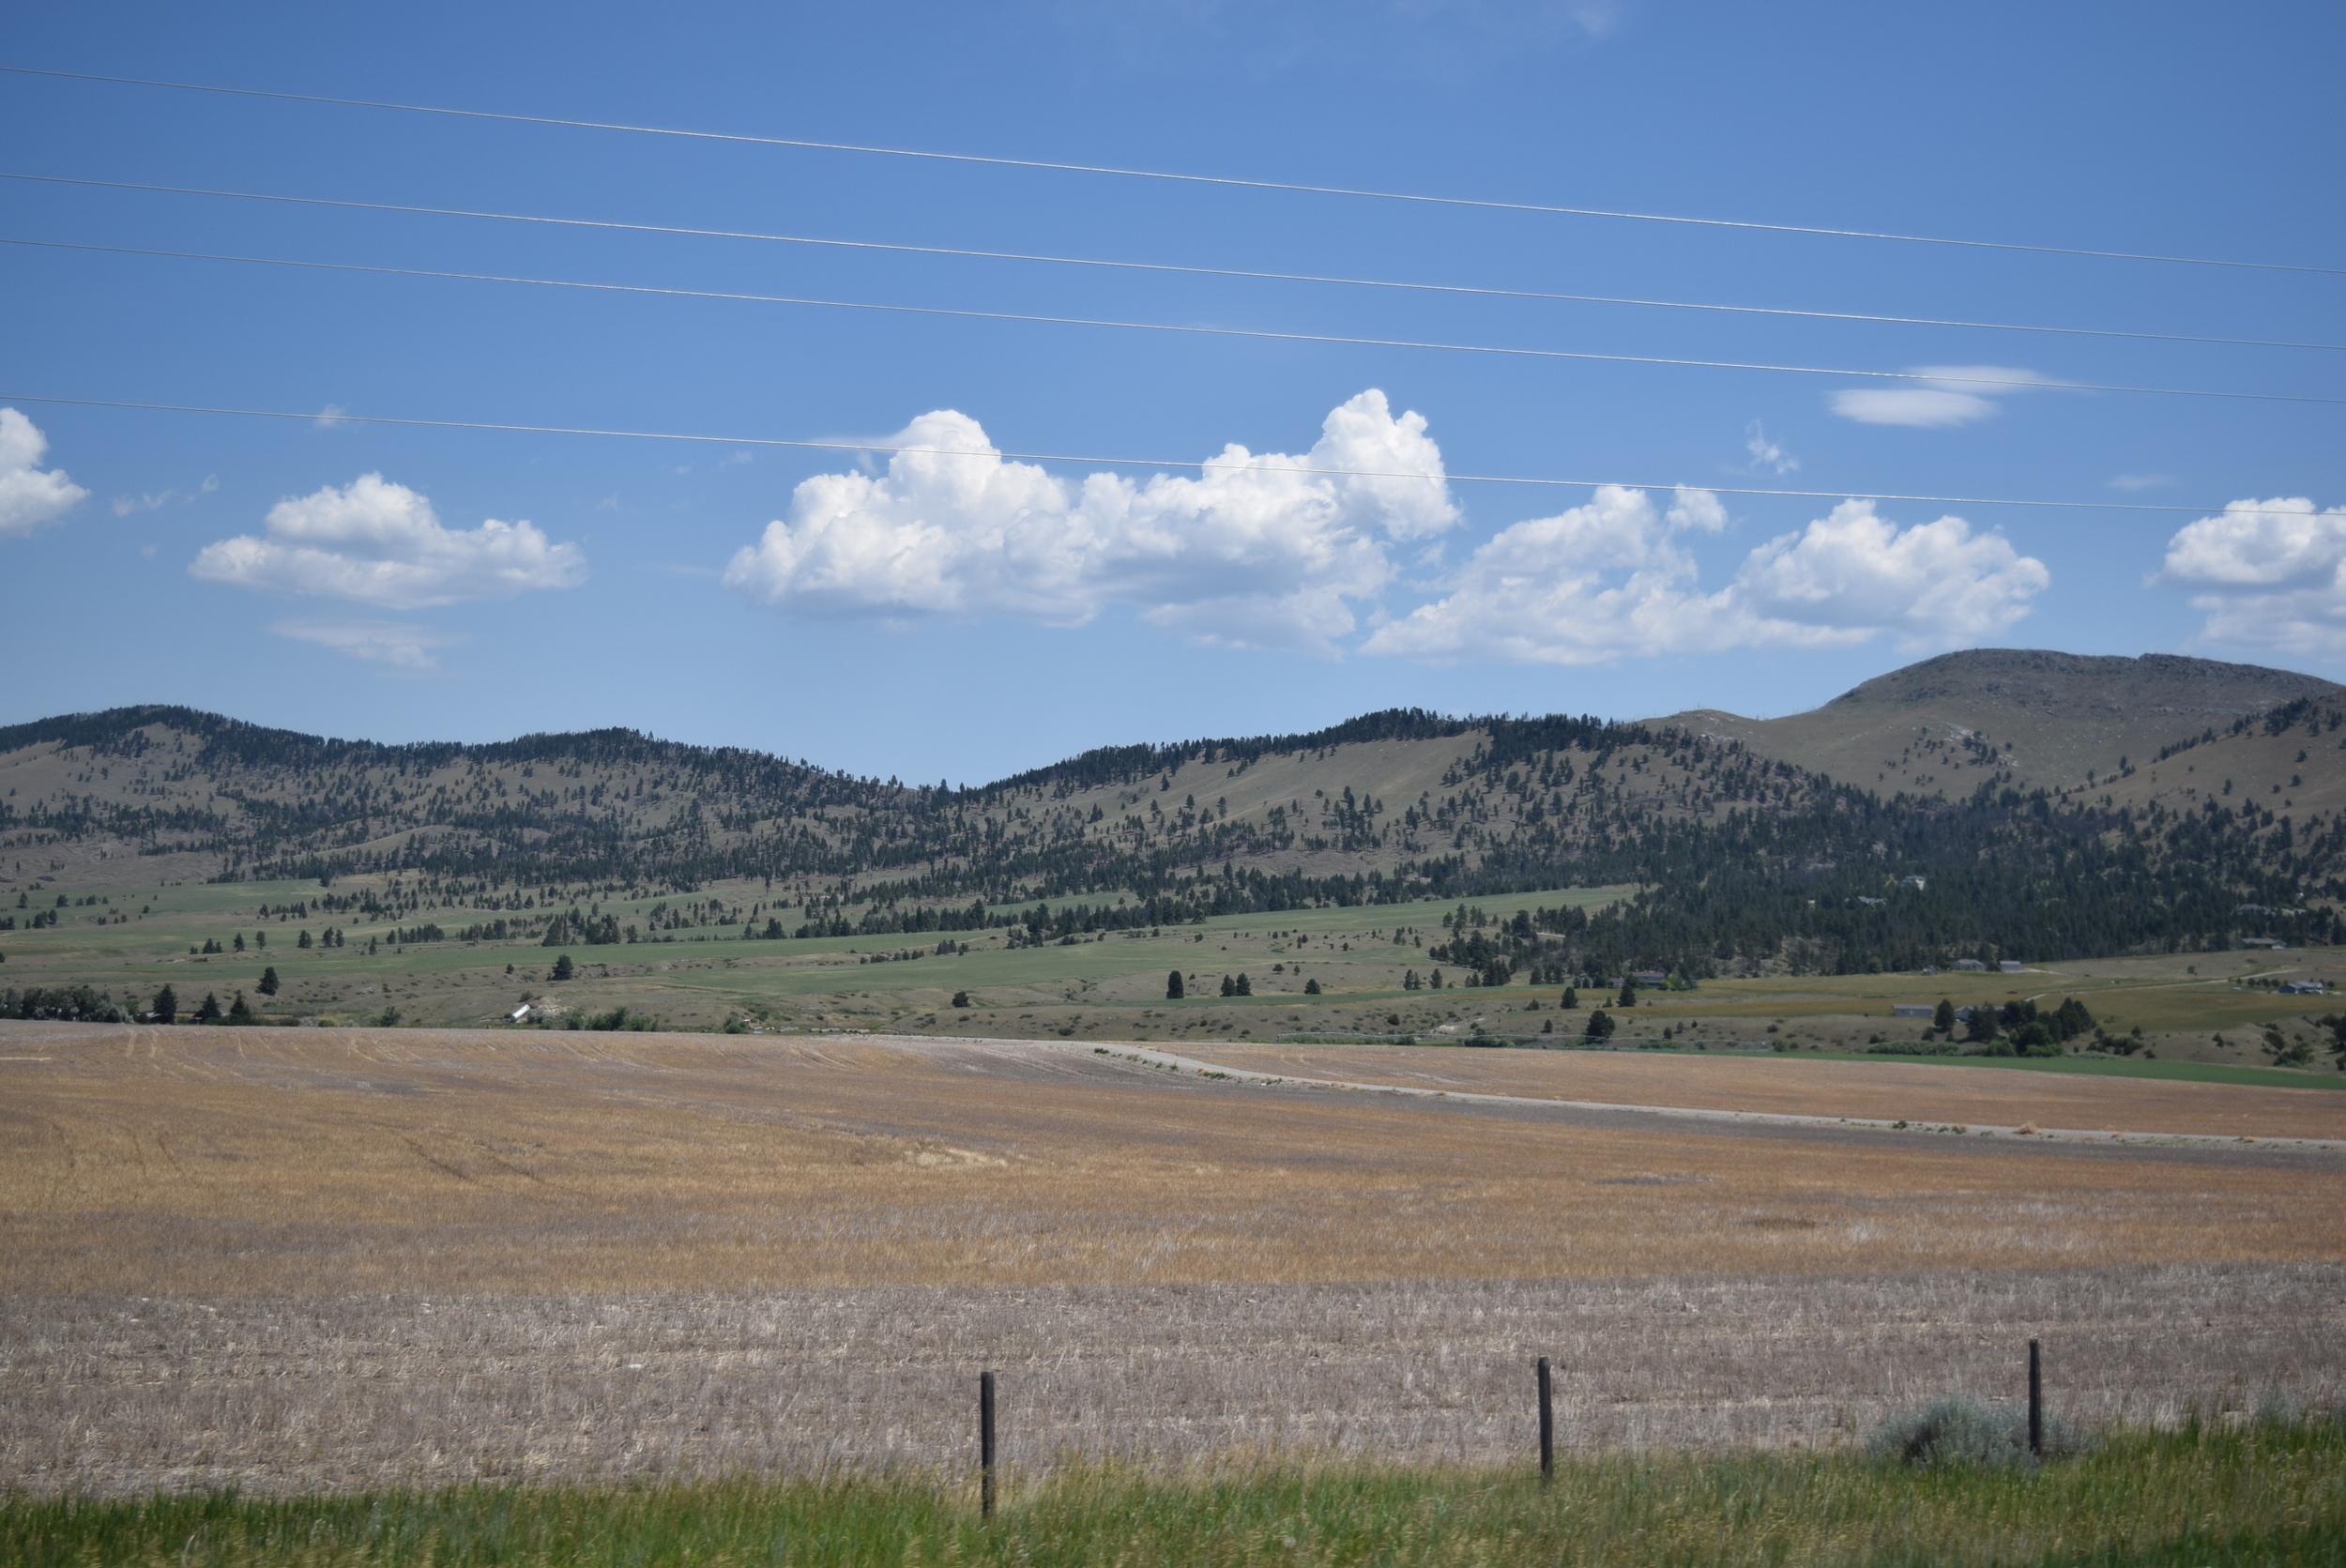 More Montana. My Mama said to take lots of photos!